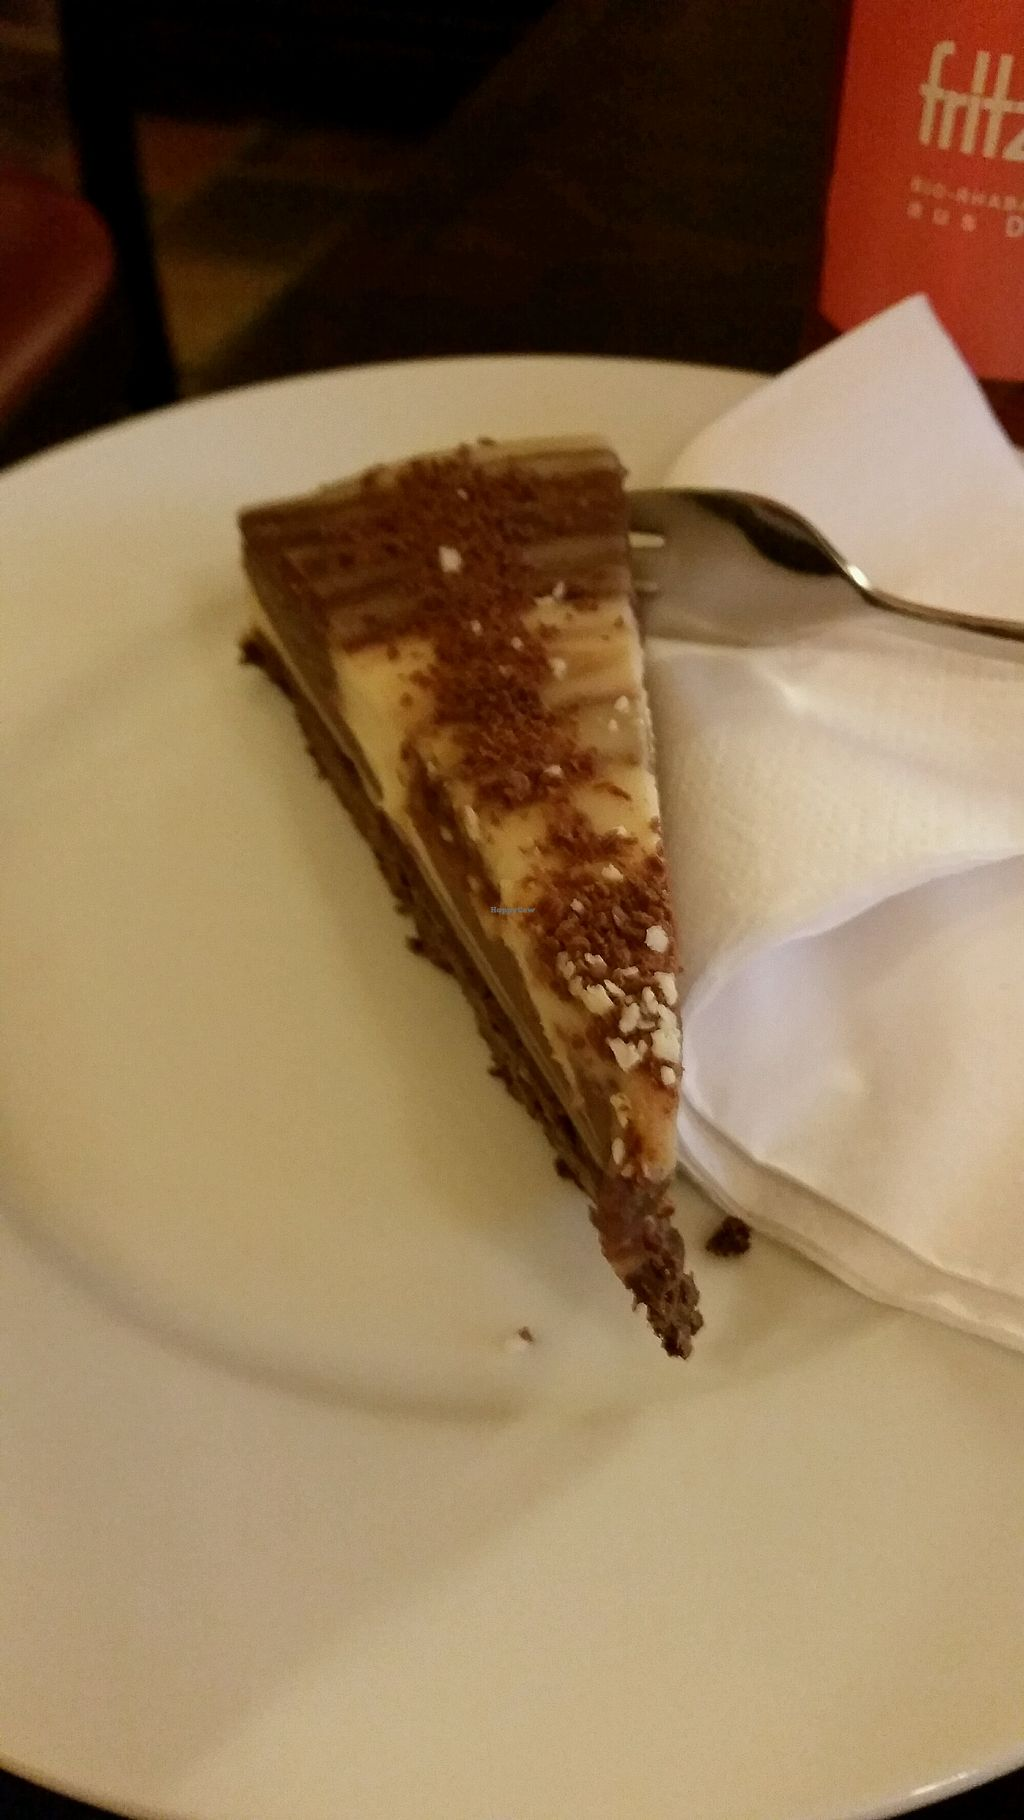 "Photo of KUGEL Cafe Bistro & More  by <a href=""/members/profile/DiscoStu"">DiscoStu</a> <br/>Schoko Brownie Tarte (vegan, glutenfree) <br/> January 31, 2018  - <a href='/contact/abuse/image/79660/353124'>Report</a>"